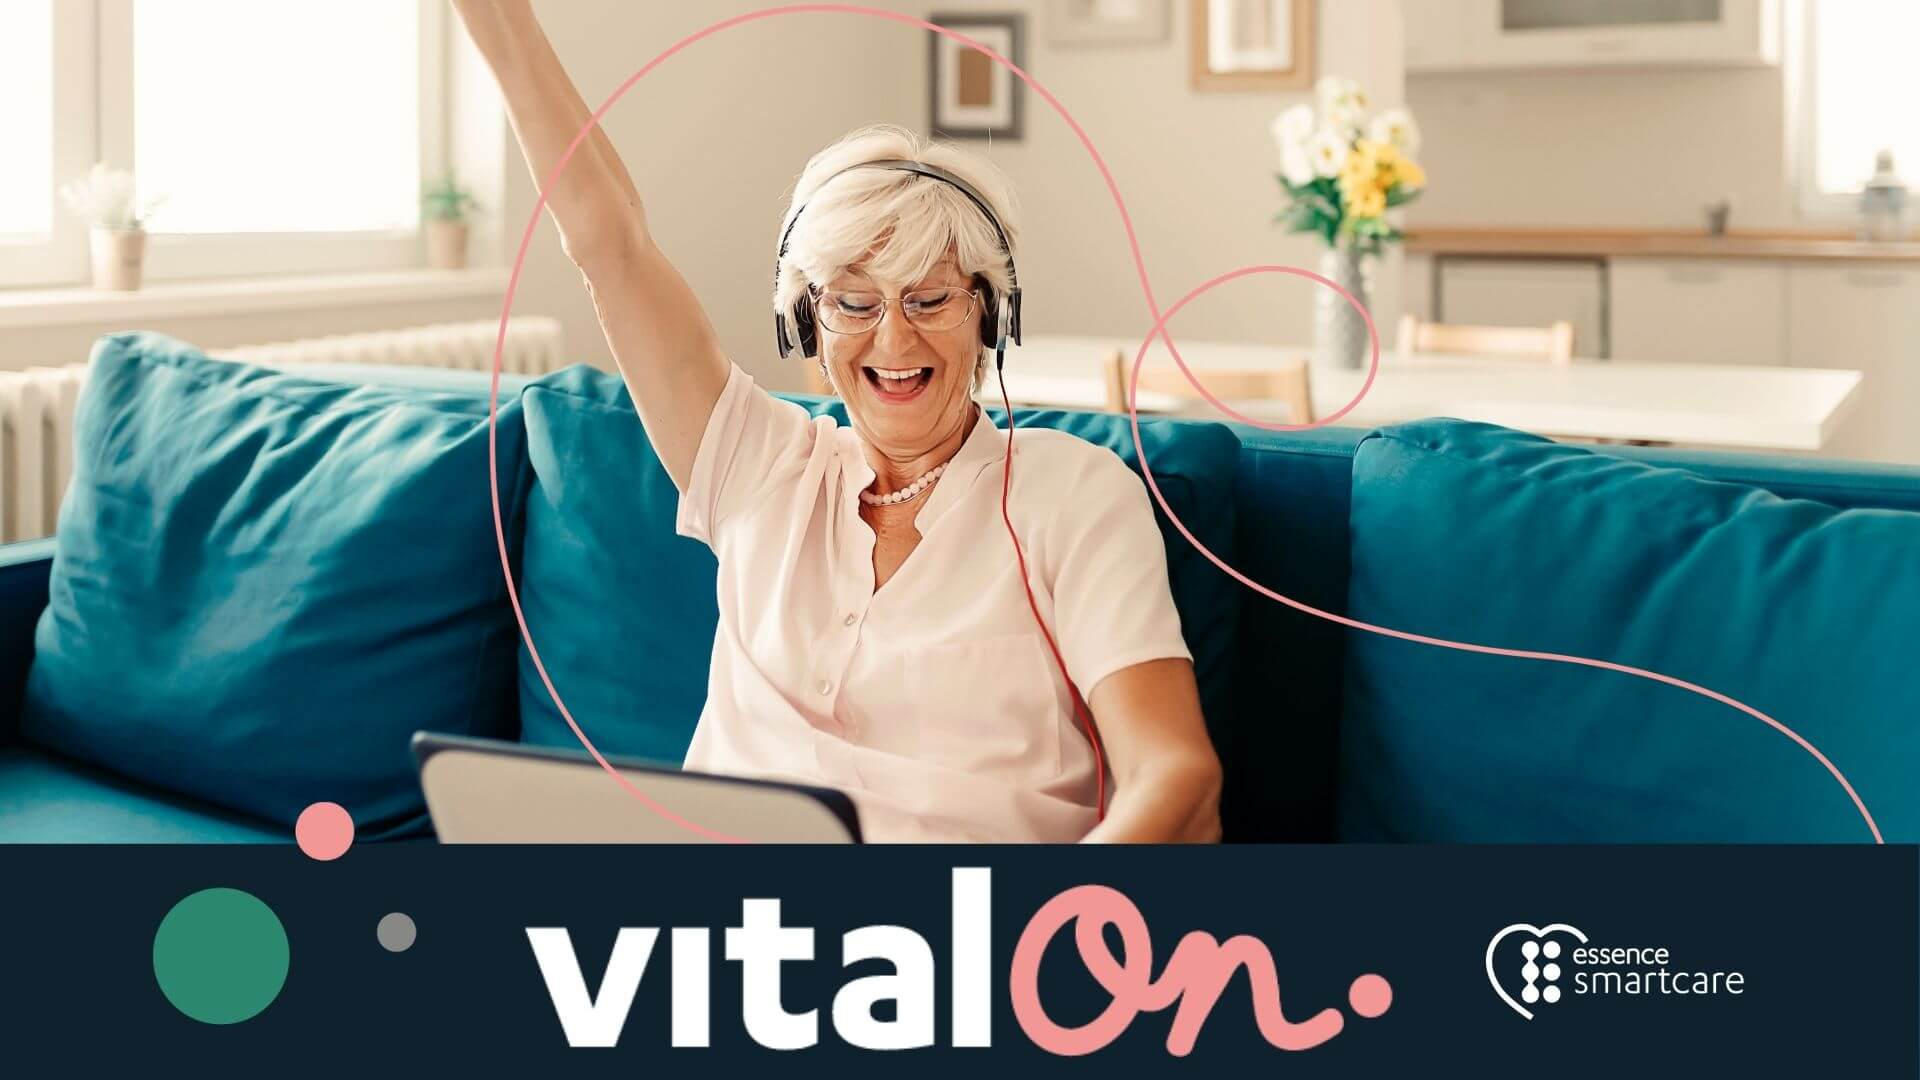 VitalOn by Essence Smartcare